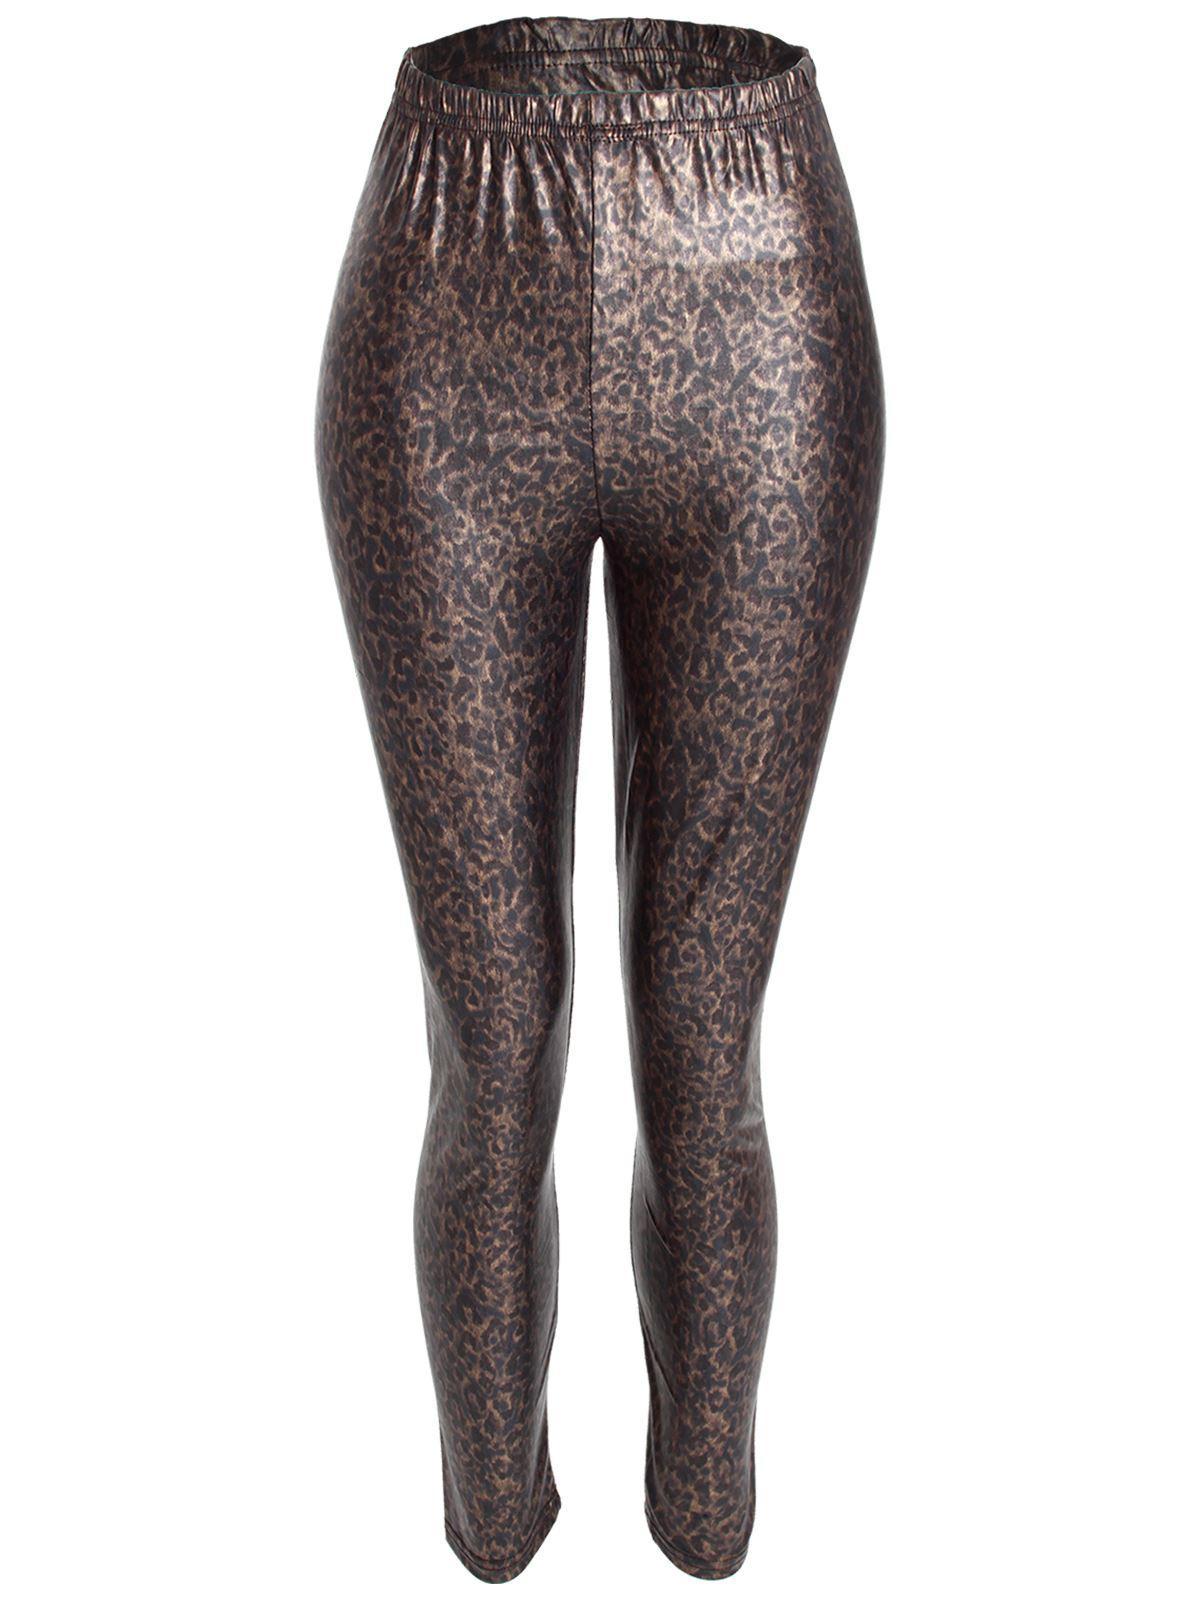 ladies womens leopard animal print stretchy leggings pants